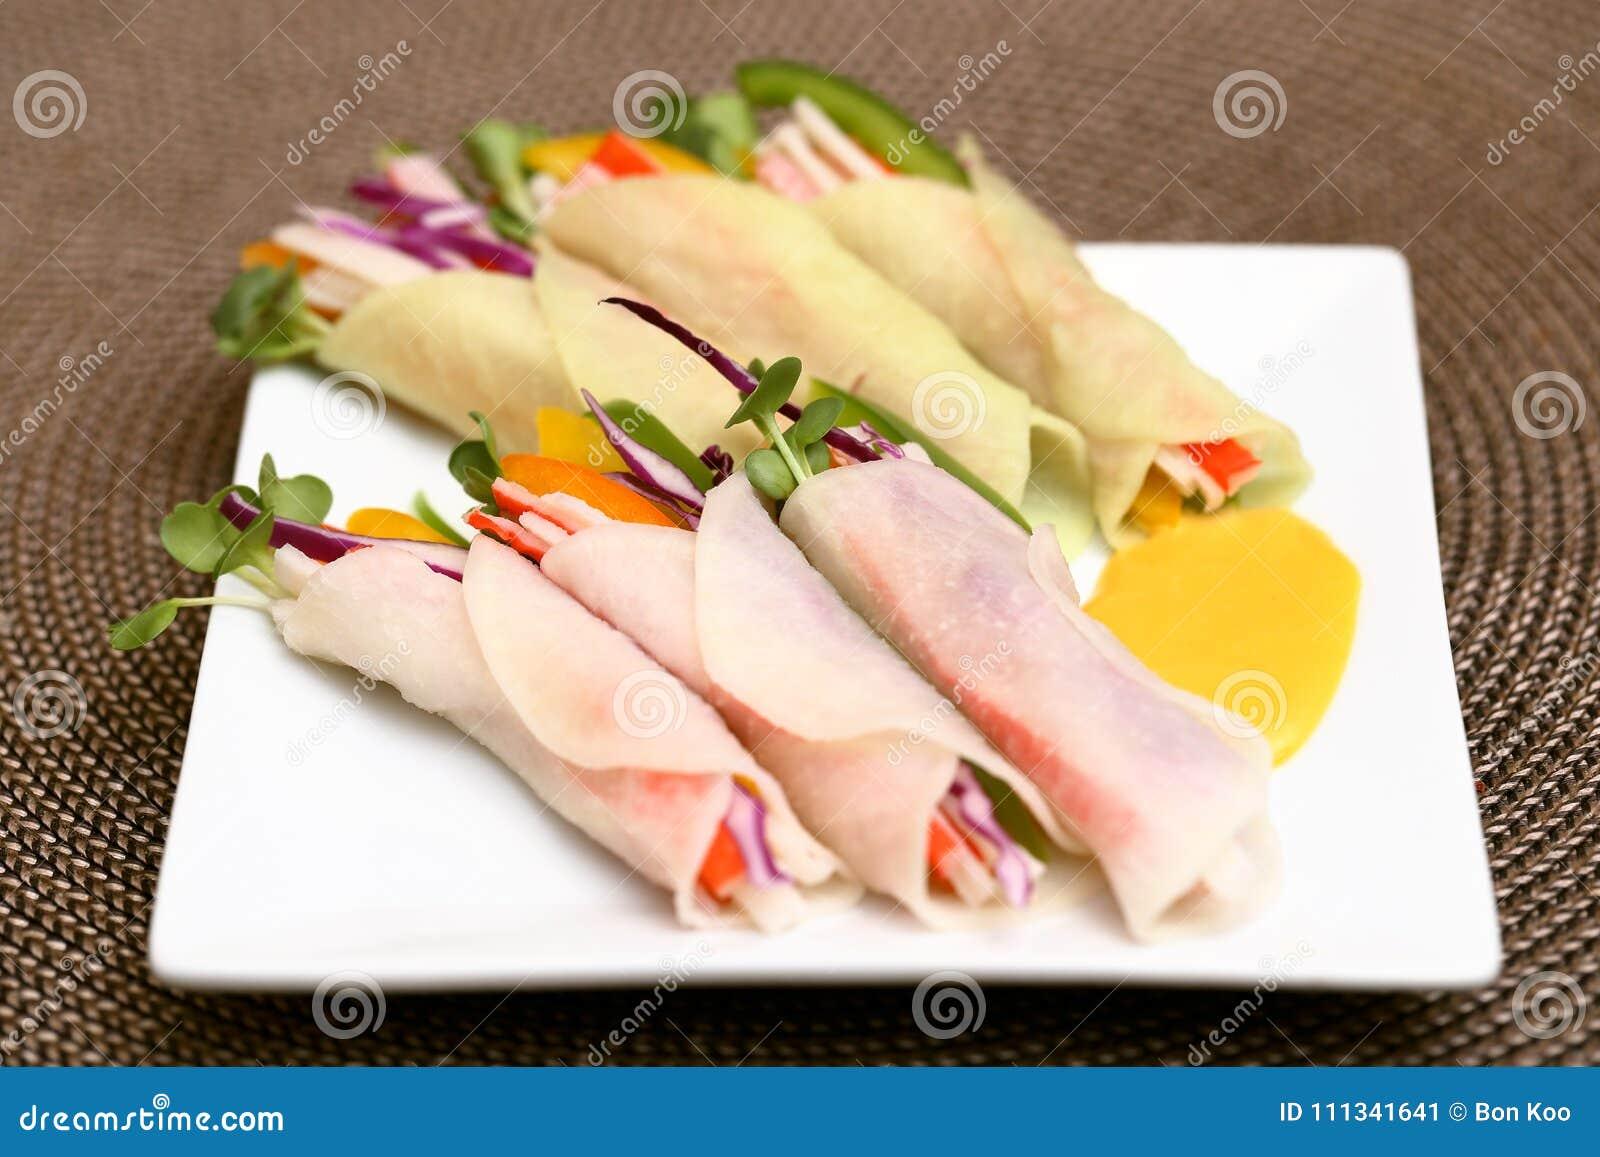 Korean Pickled Radish Wrapped Salad Rolls Stock Image Image Of Garlic Crab 111341641